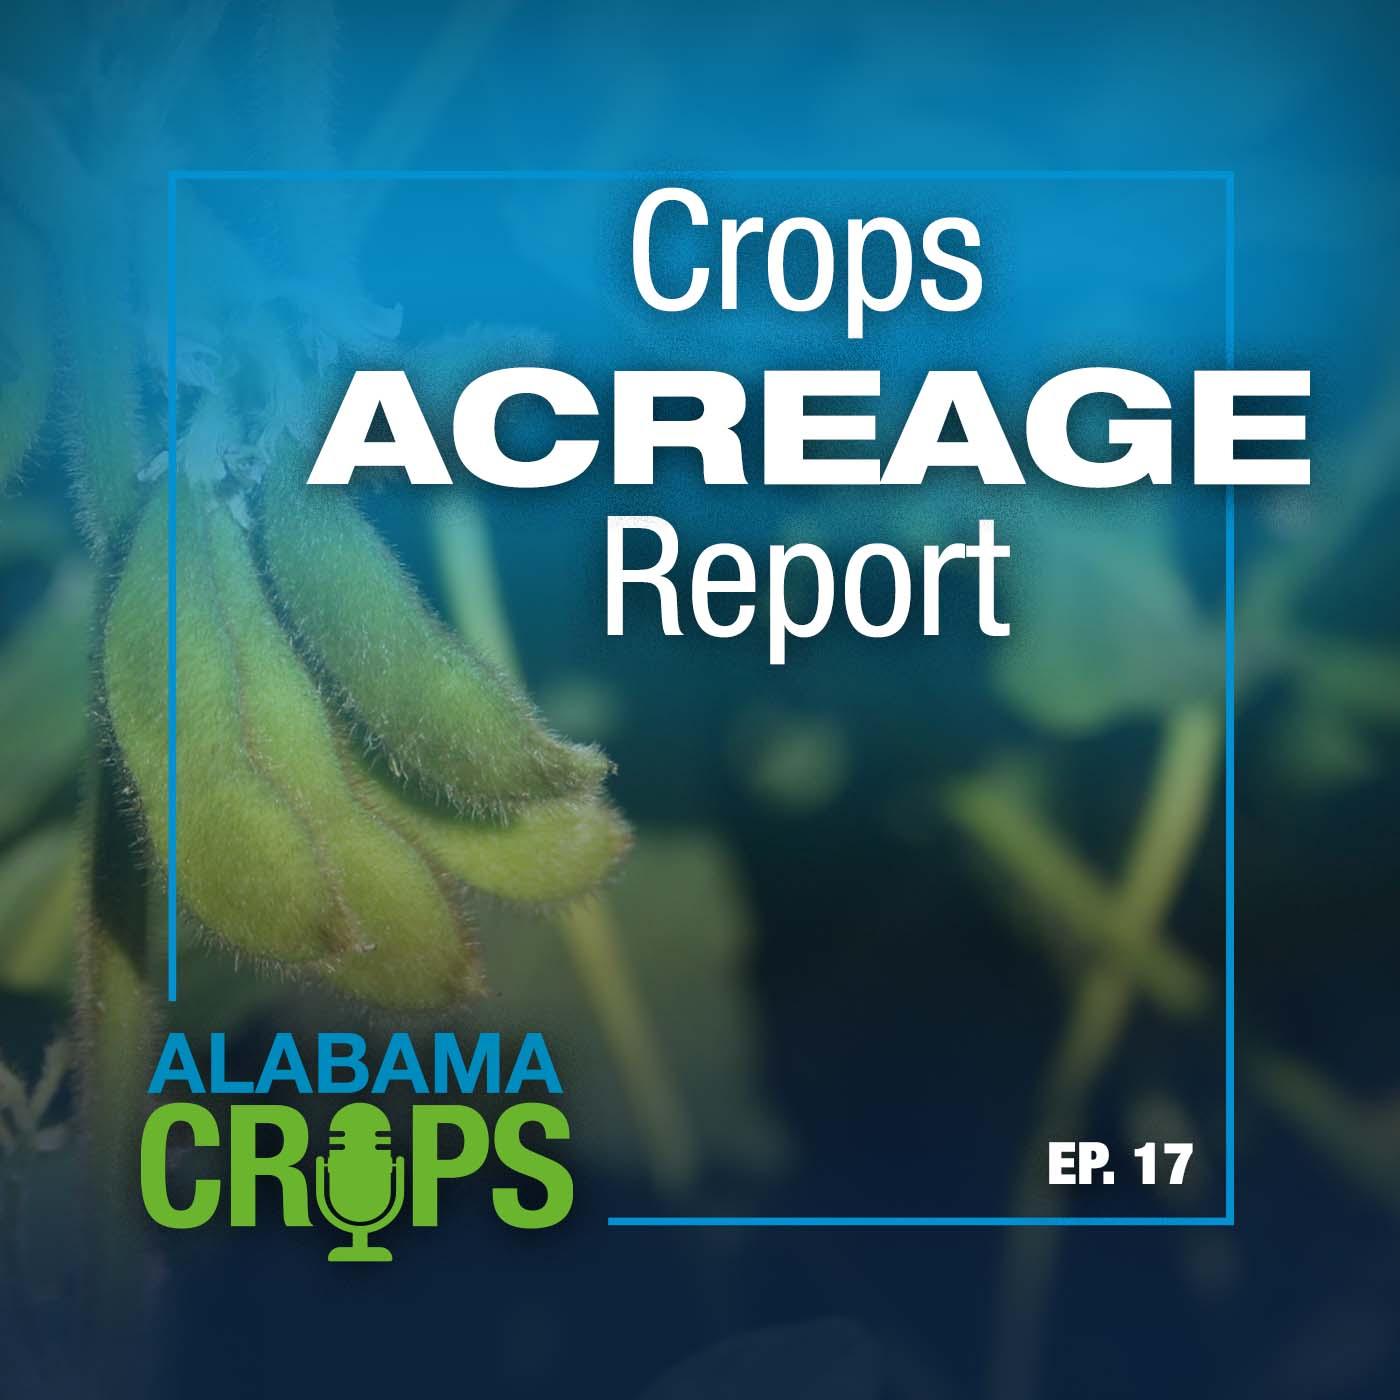 Alabama Crops Report Episode 17 - Crops Acreage Report